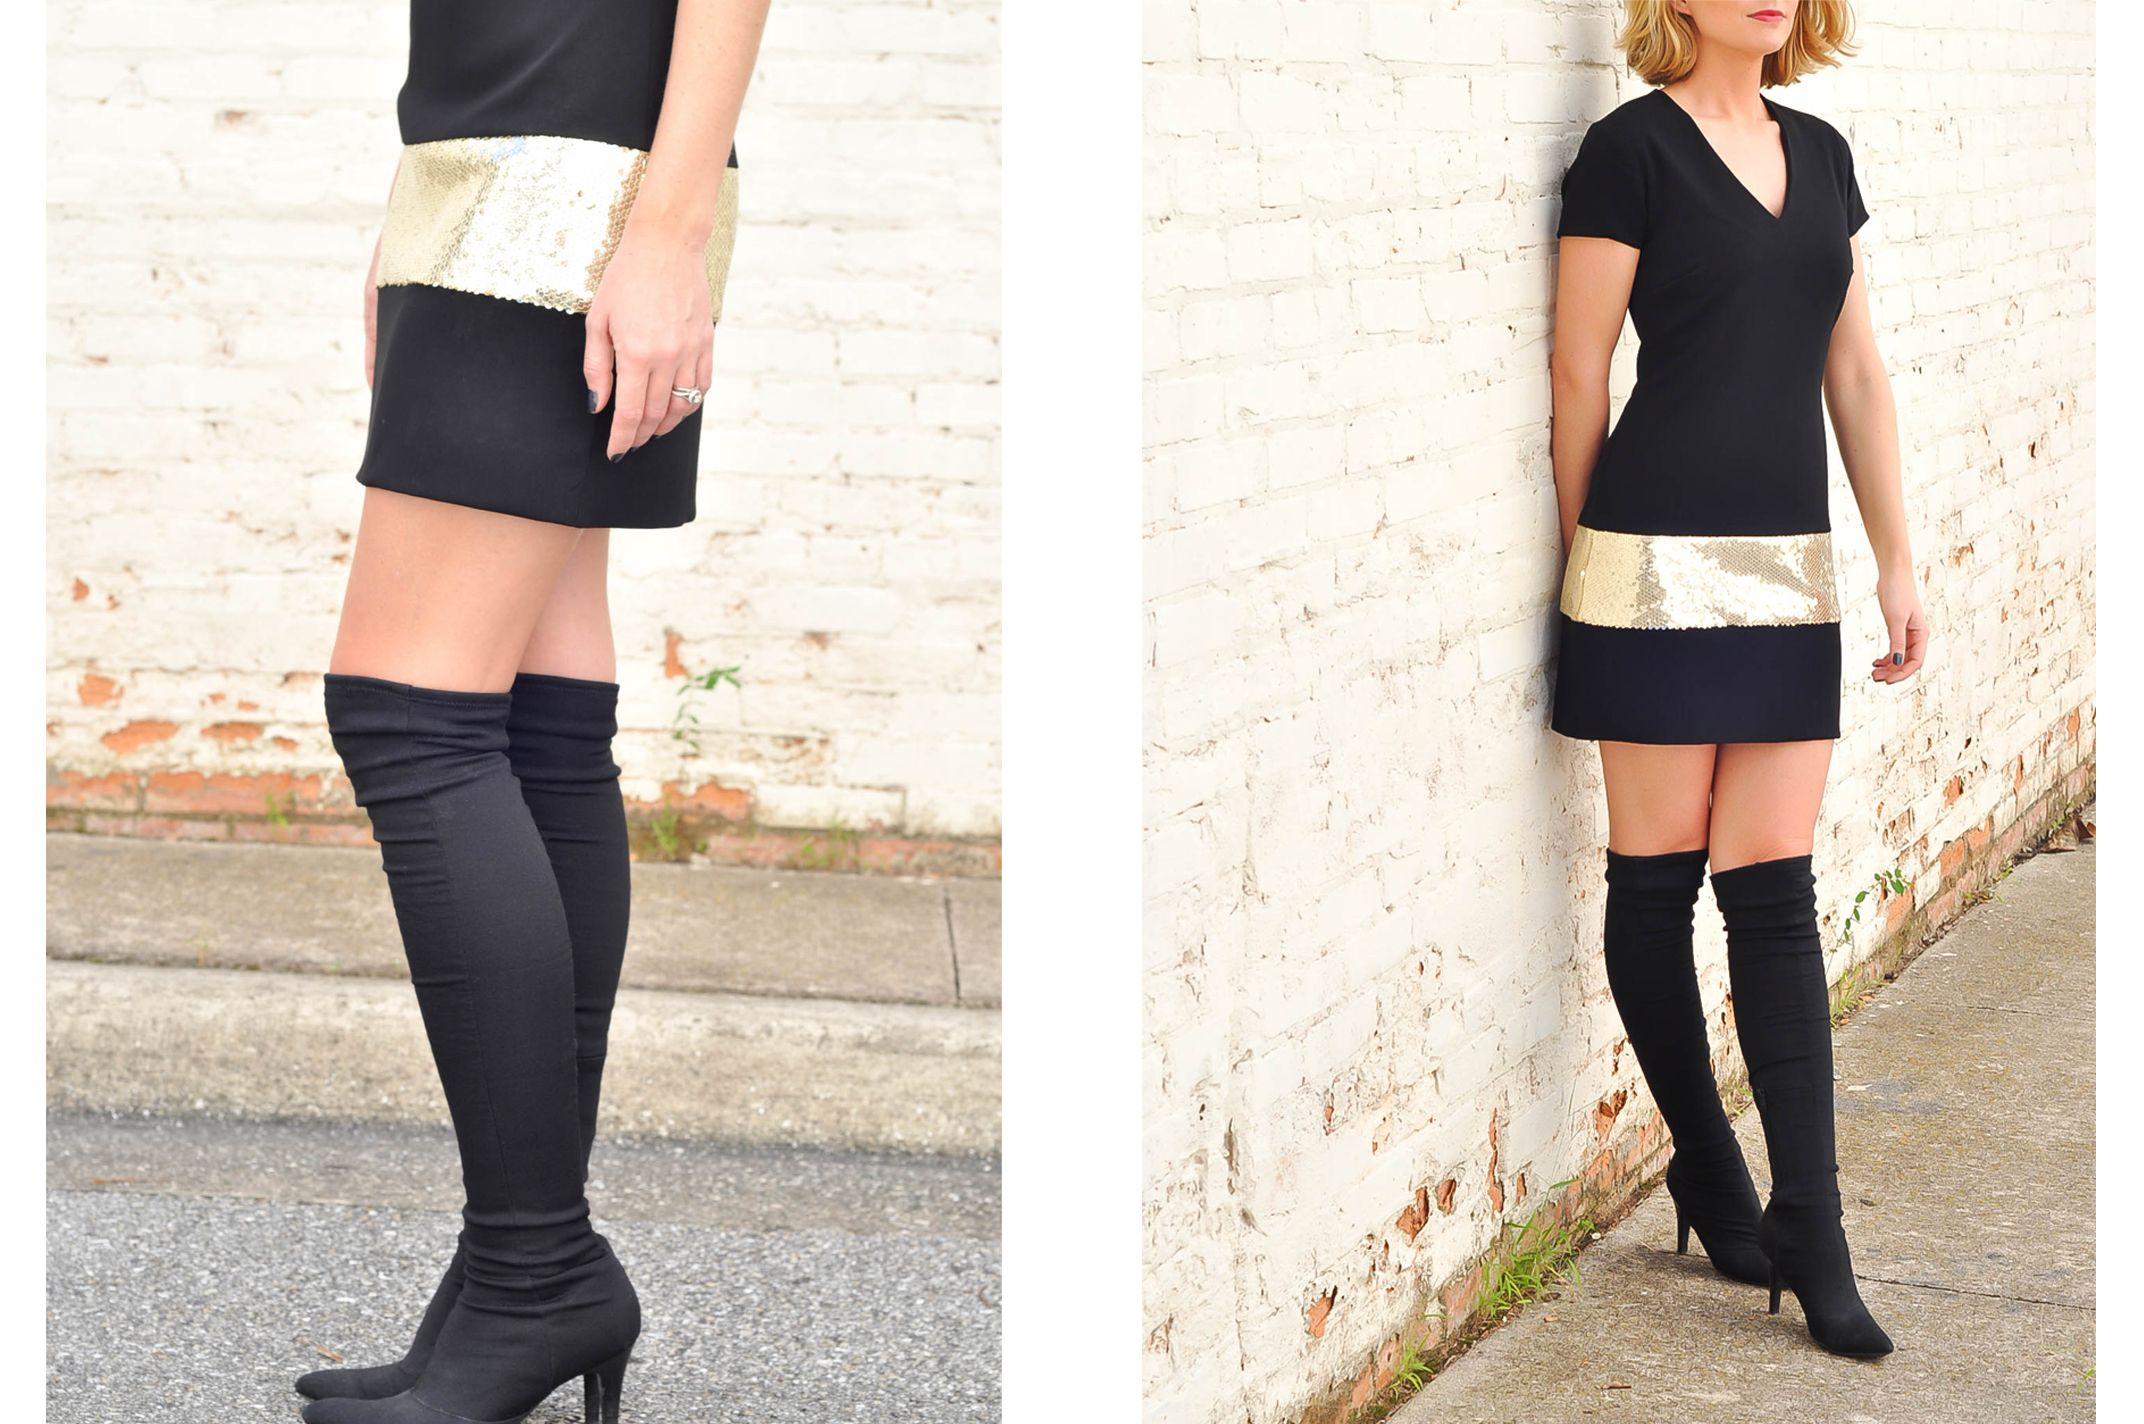 The Camilyn Beth 'Get Away' Dress in Black | FW16